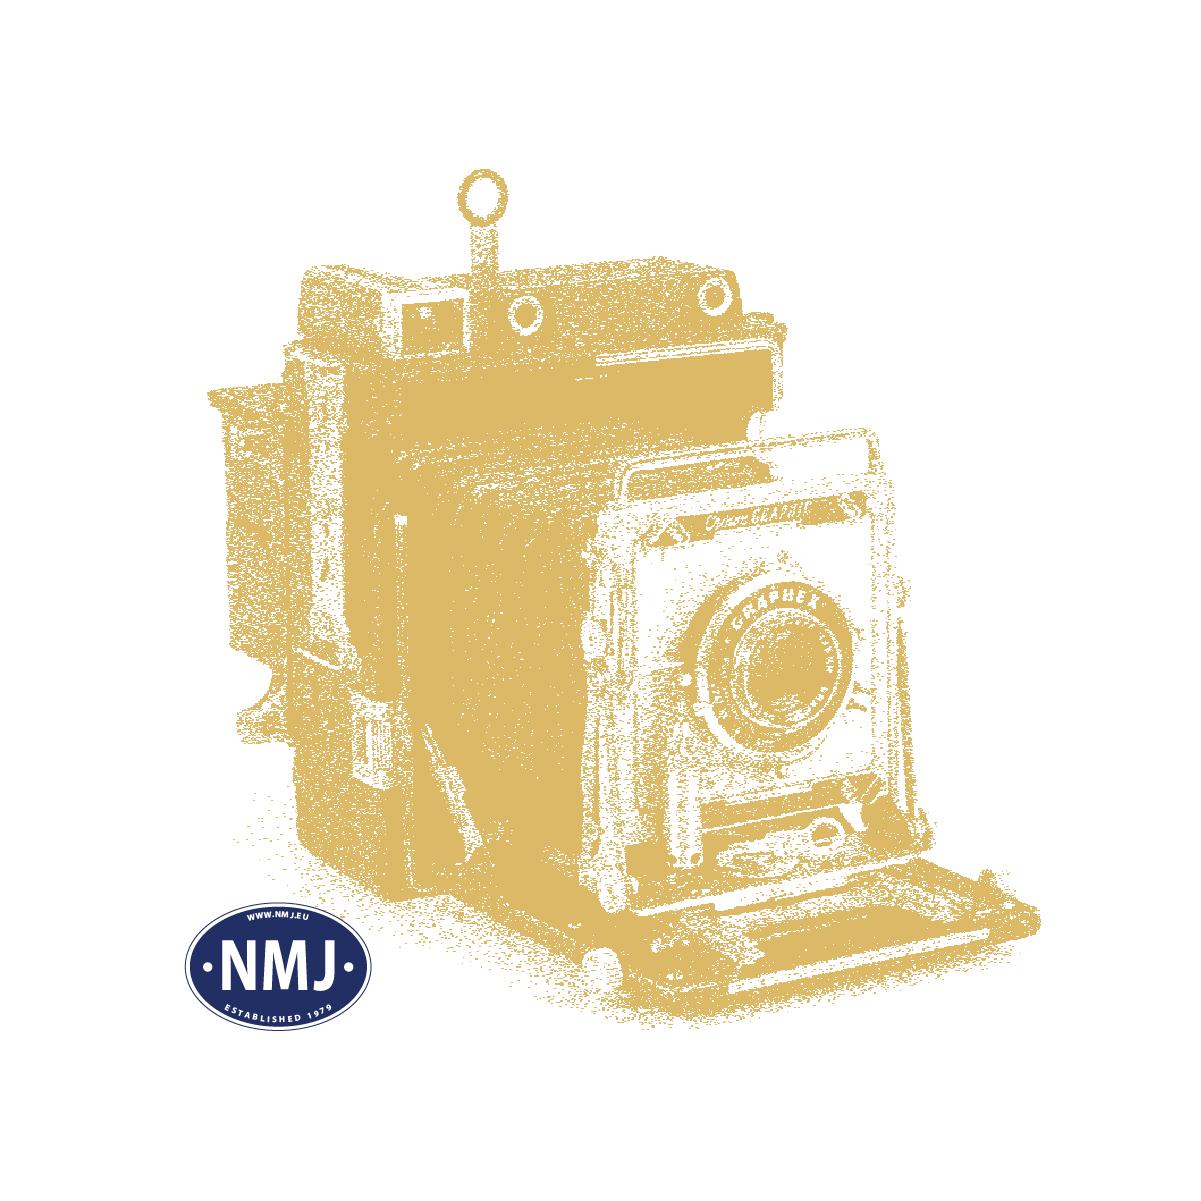 NMJS30b259 - NMJ Superline NSB Type 30b 359, Originalversjon